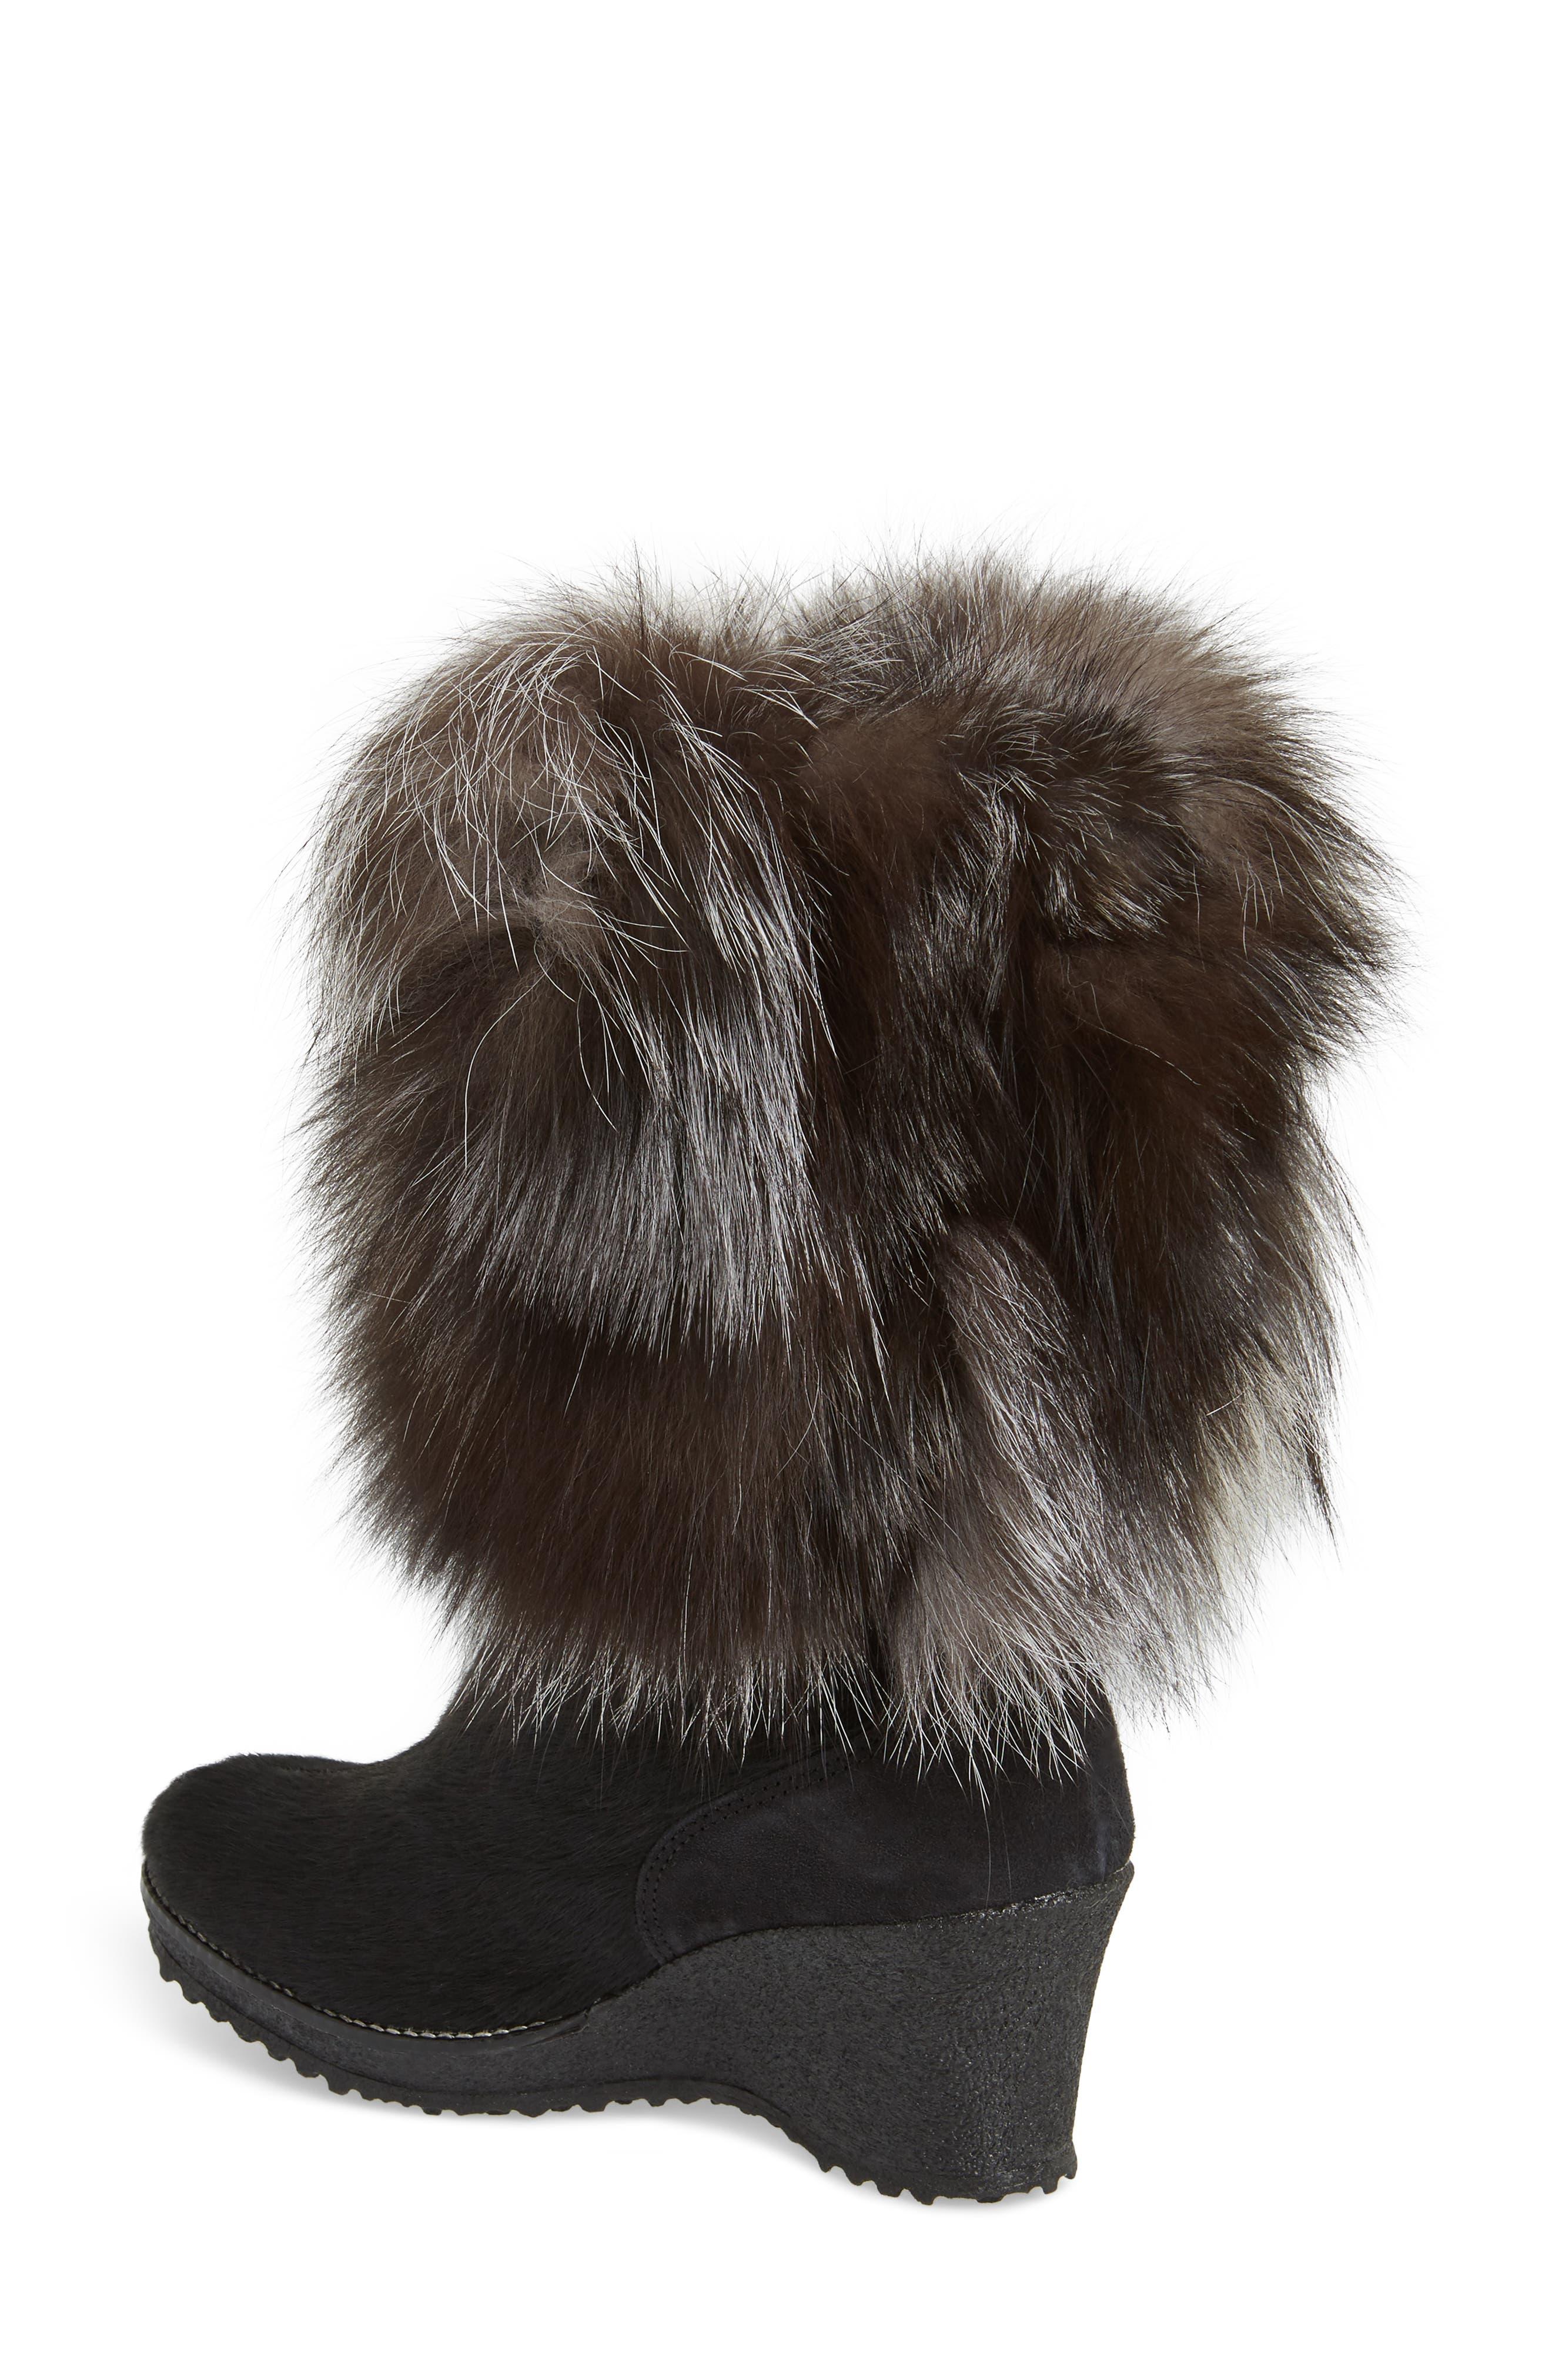 Angelina Genuine Fox Fur Wedge Boot,                             Alternate thumbnail 2, color,                             001